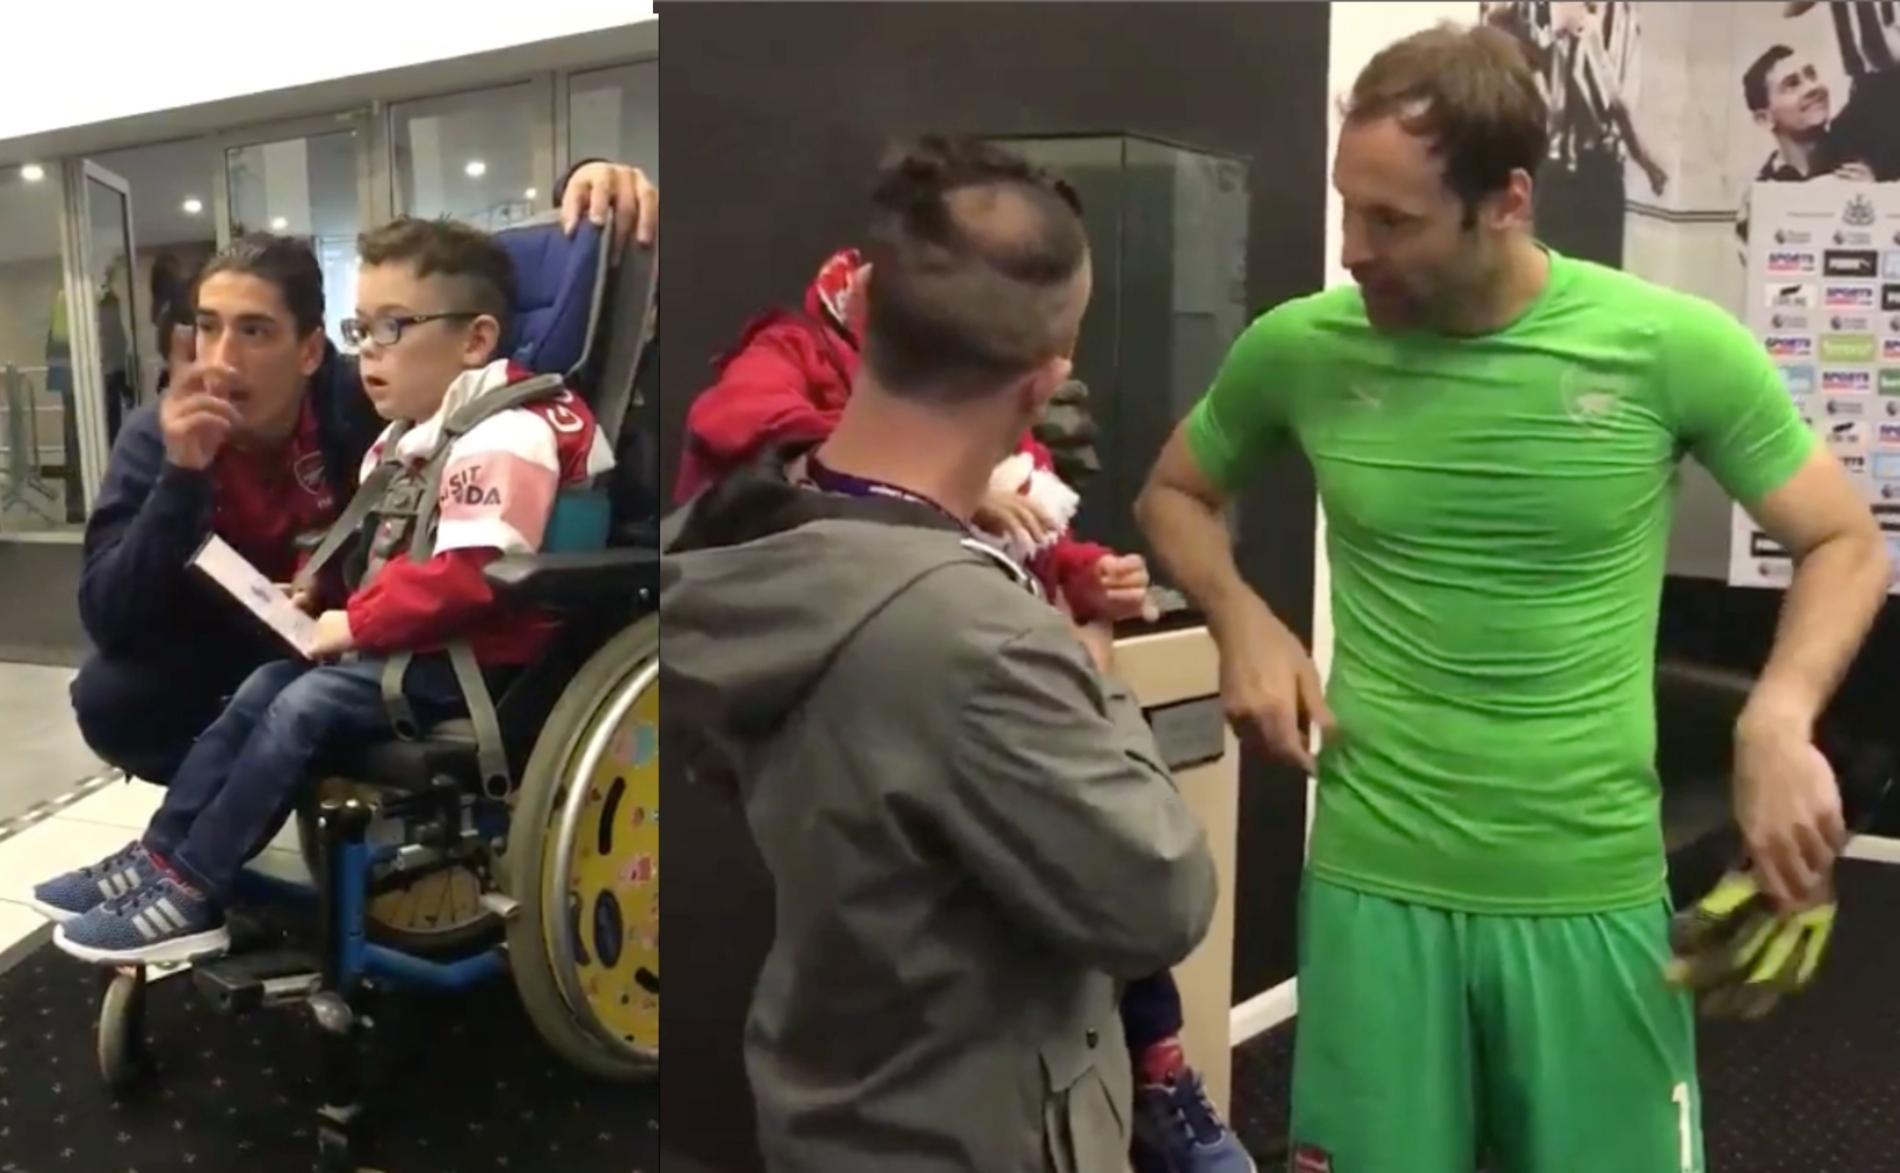 Arsenal Fan Meets His Hero Petr Čech In A Heart-Warming Meeting